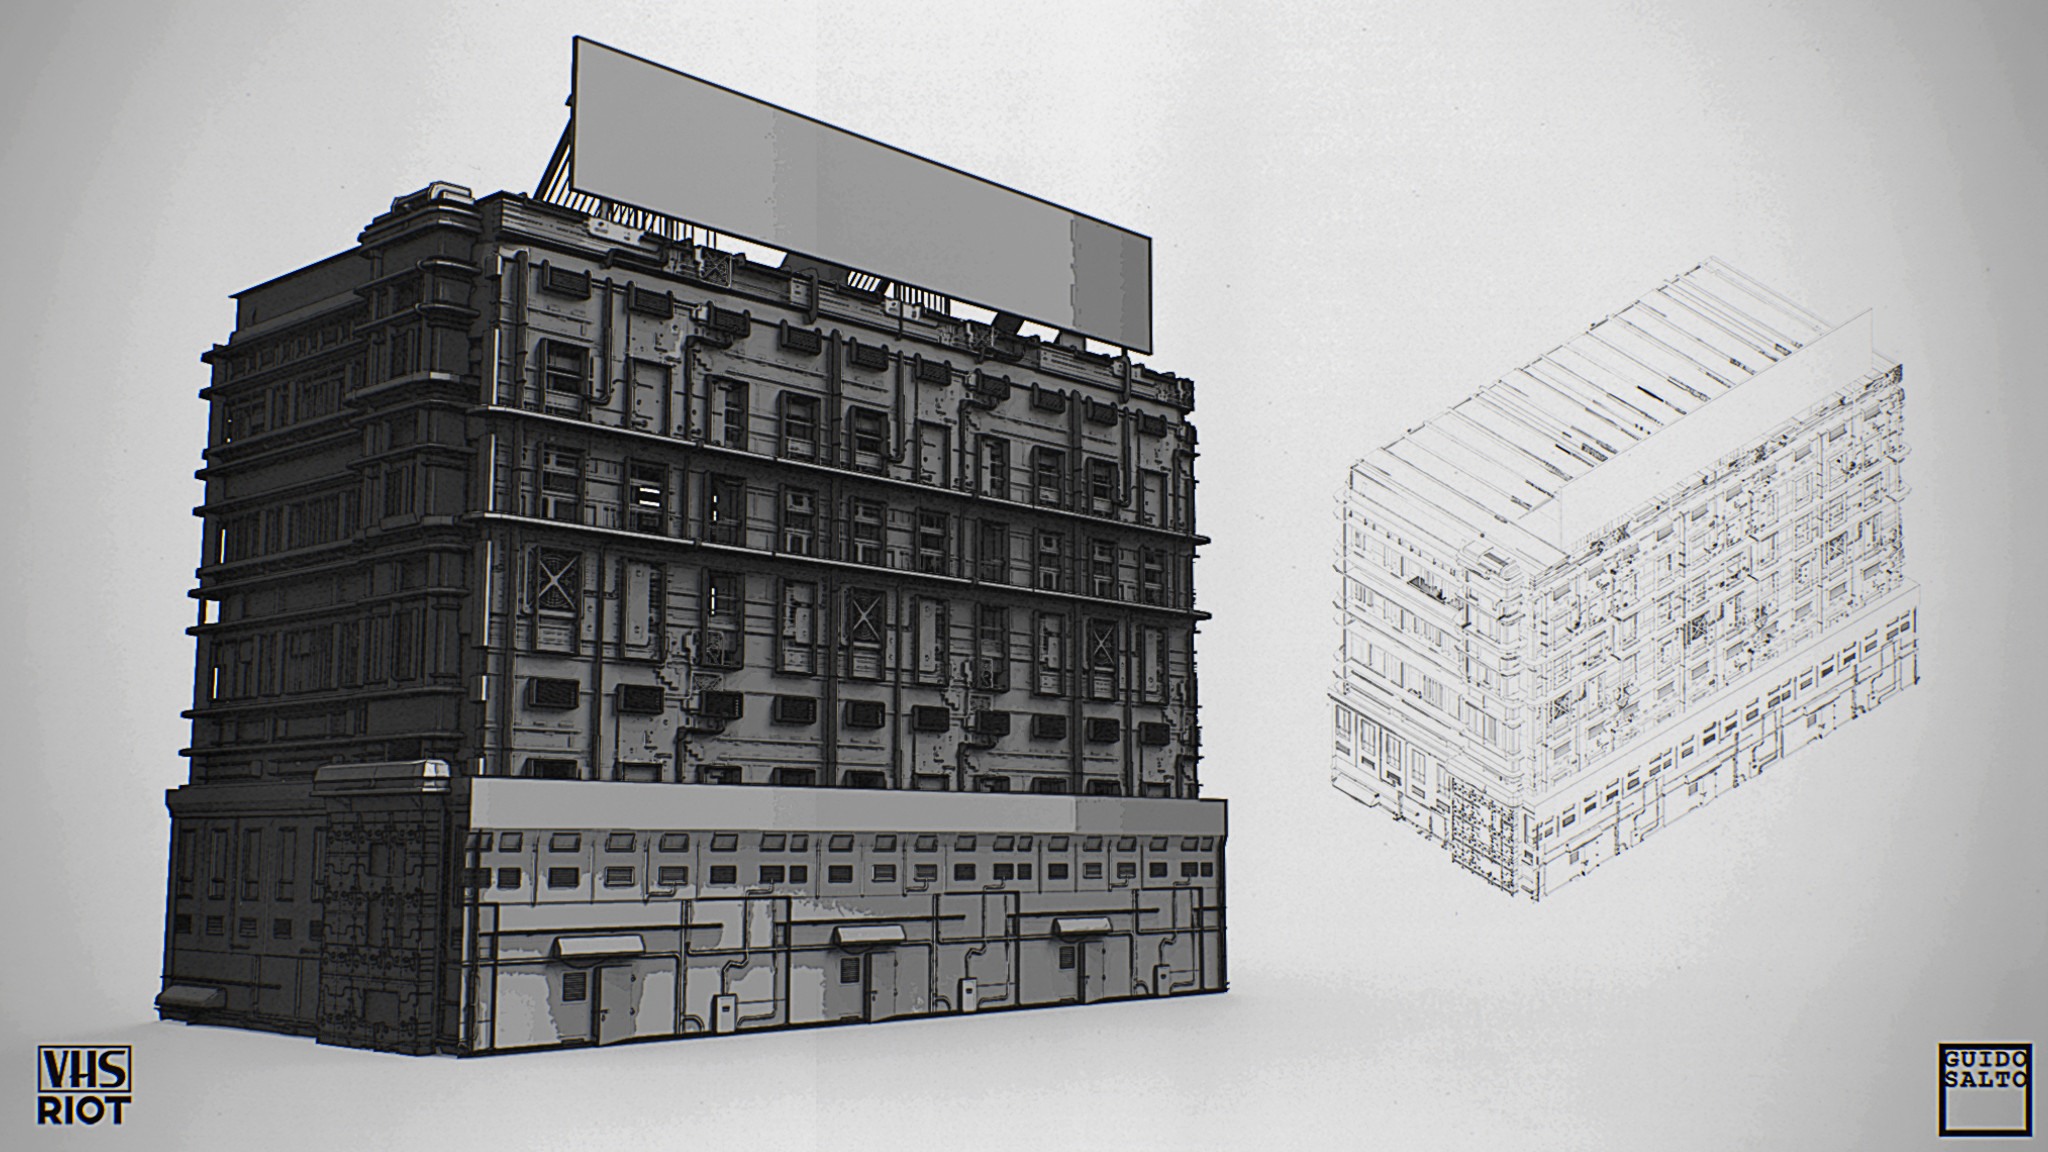 3d concept sketches